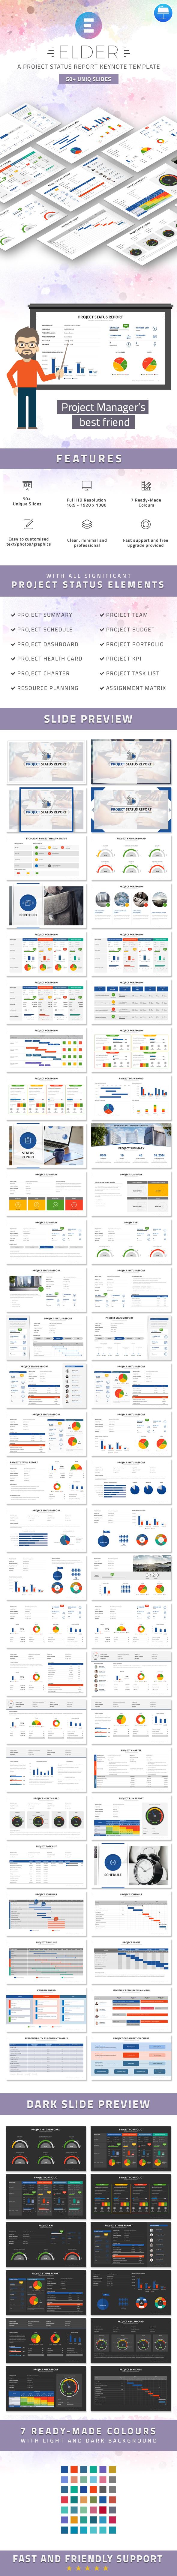 Elder – A Project Status Report Keynote Template - Keynote Templates Presentation Templates